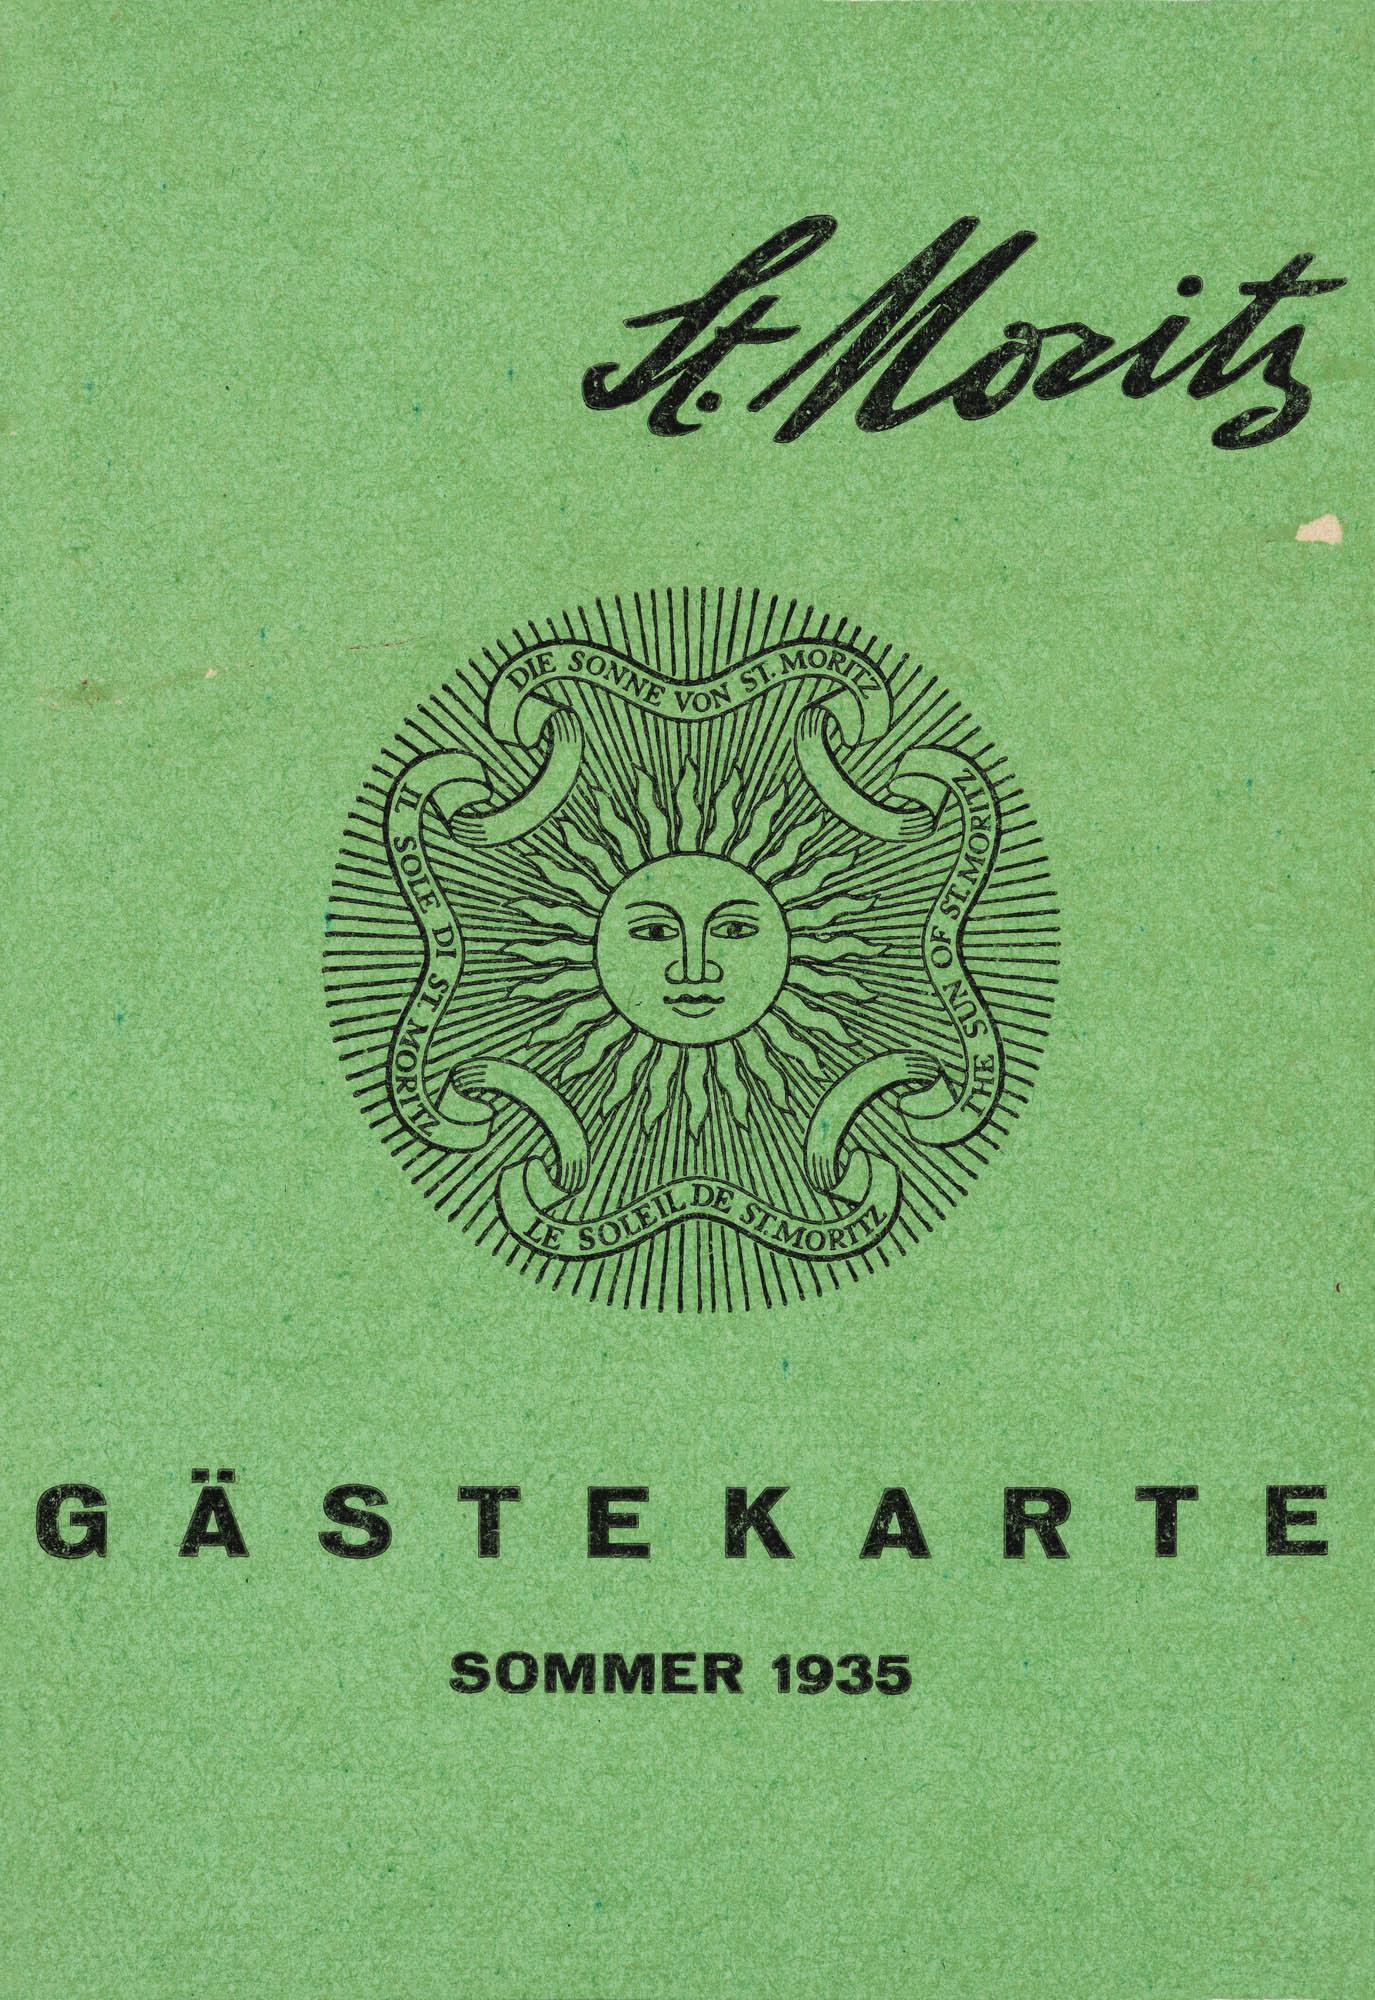 St. Moritz Walter Herdeg Étiquette bagages